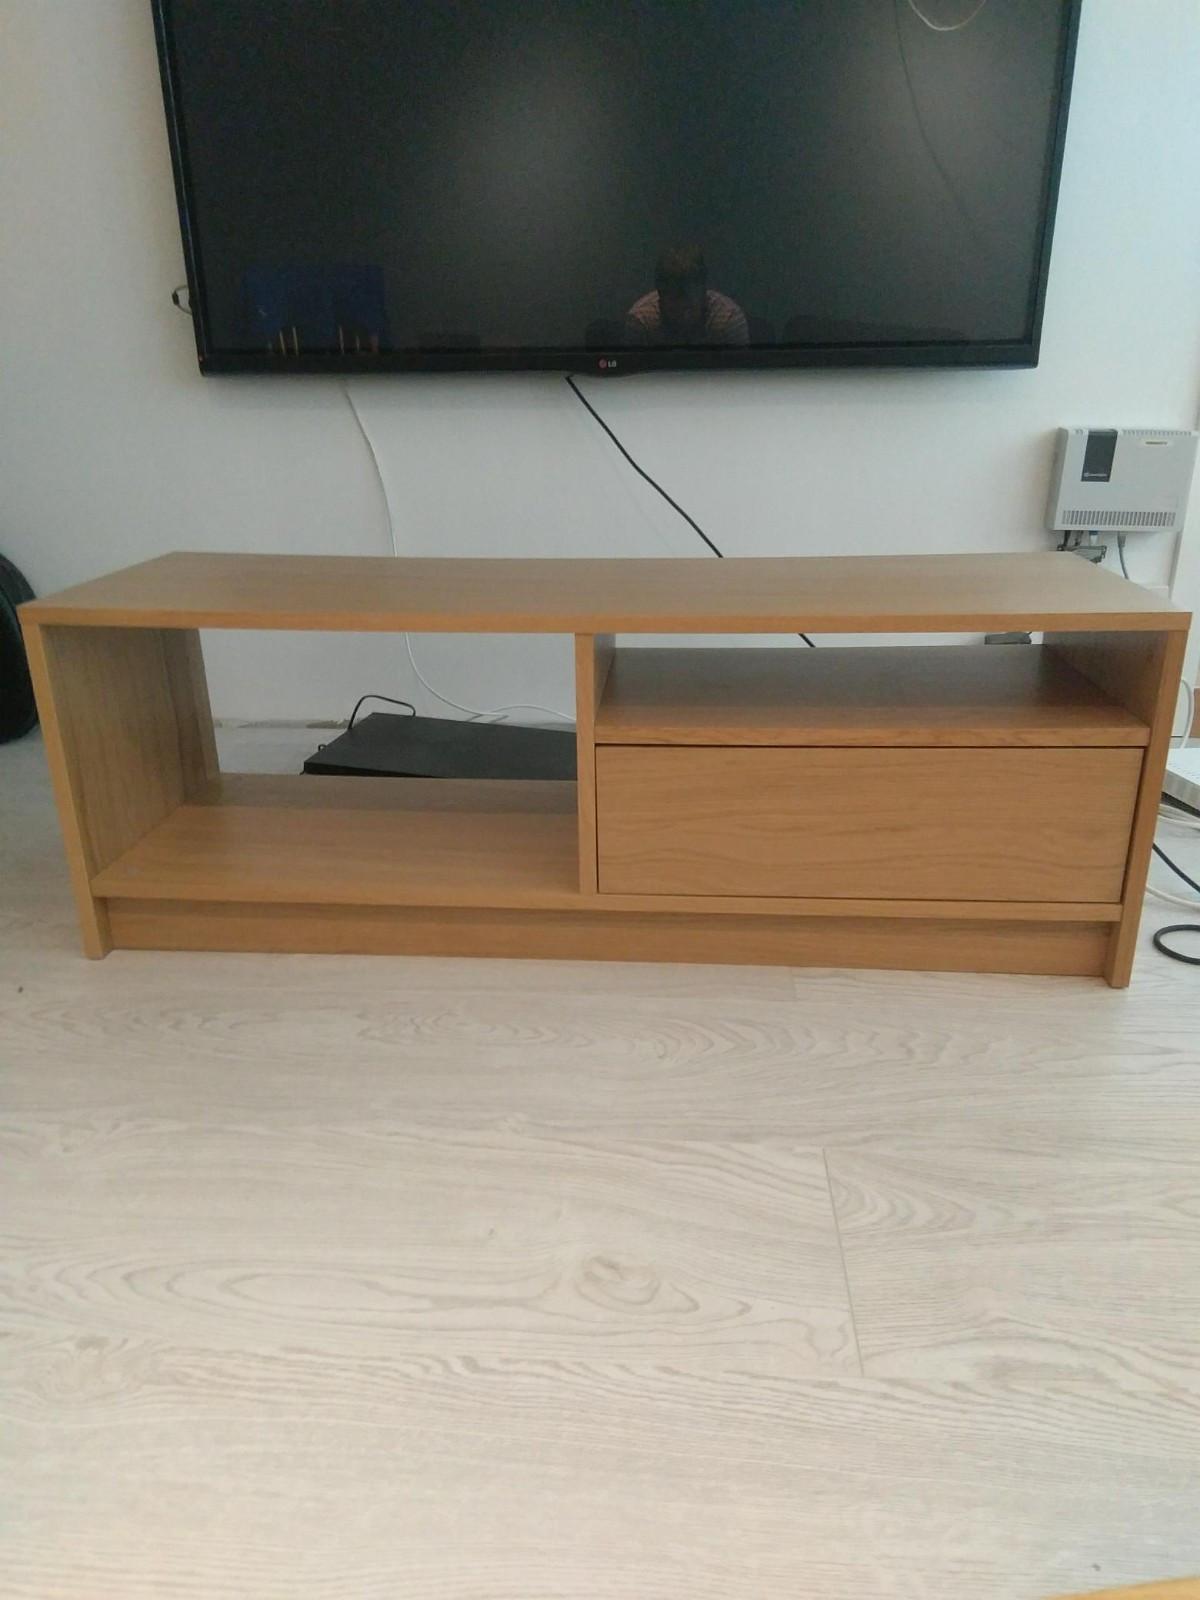 Benno Tv-benk - Fyllingsdalen  - Pent brukt IKEA benno TV-en. Med ei skuff.   BXHXD 120x42, 5x39 - Fyllingsdalen